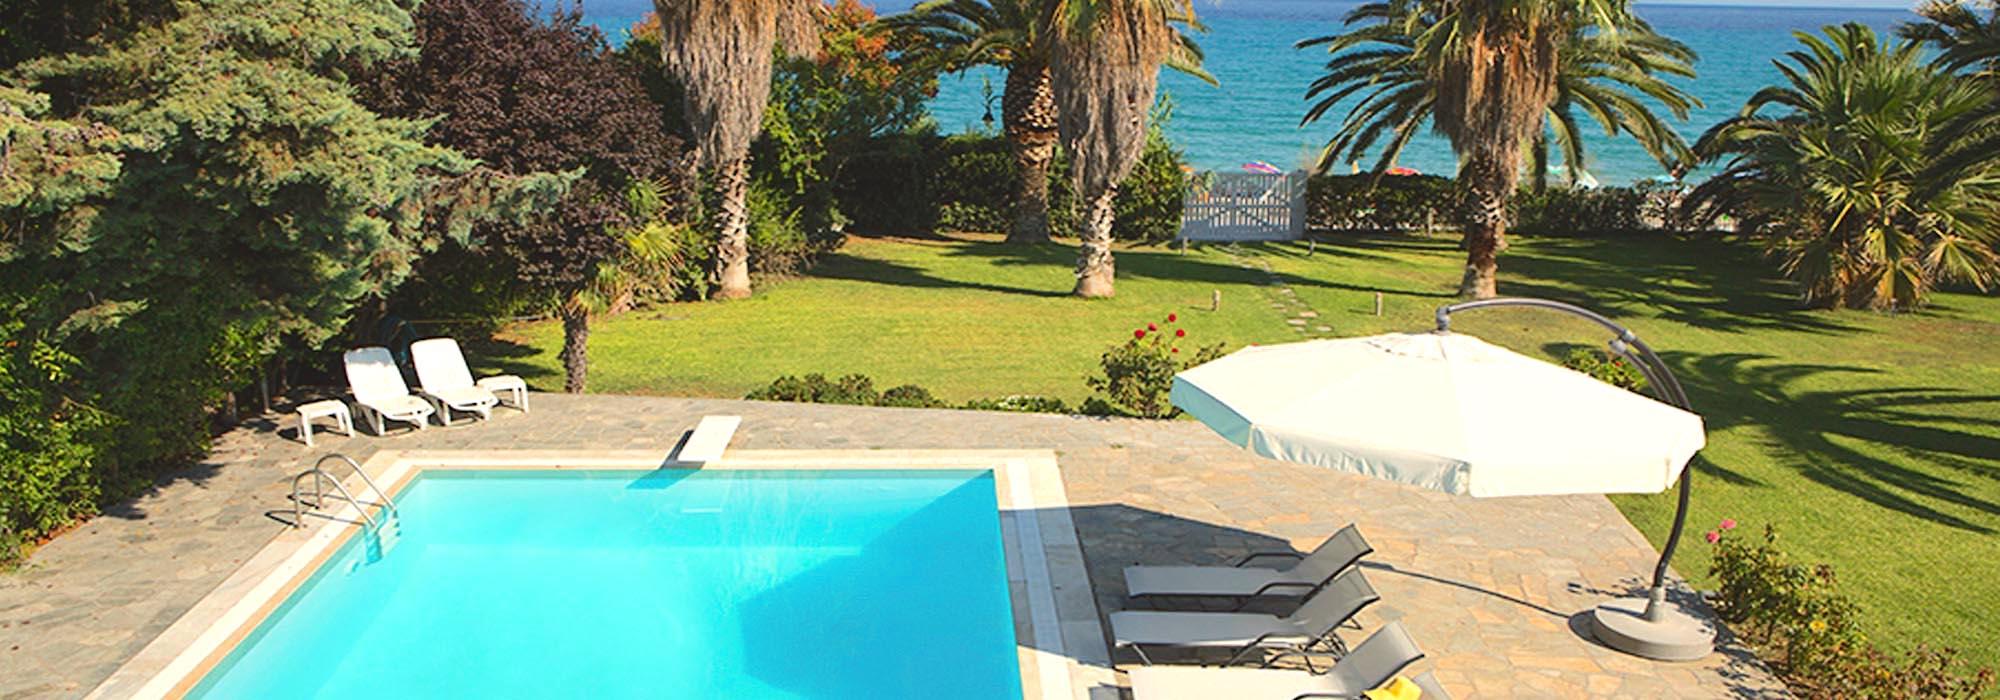 Luxury Seafront Top Villa, at Pefkohori Halkidiki, Price Reduced 1 million